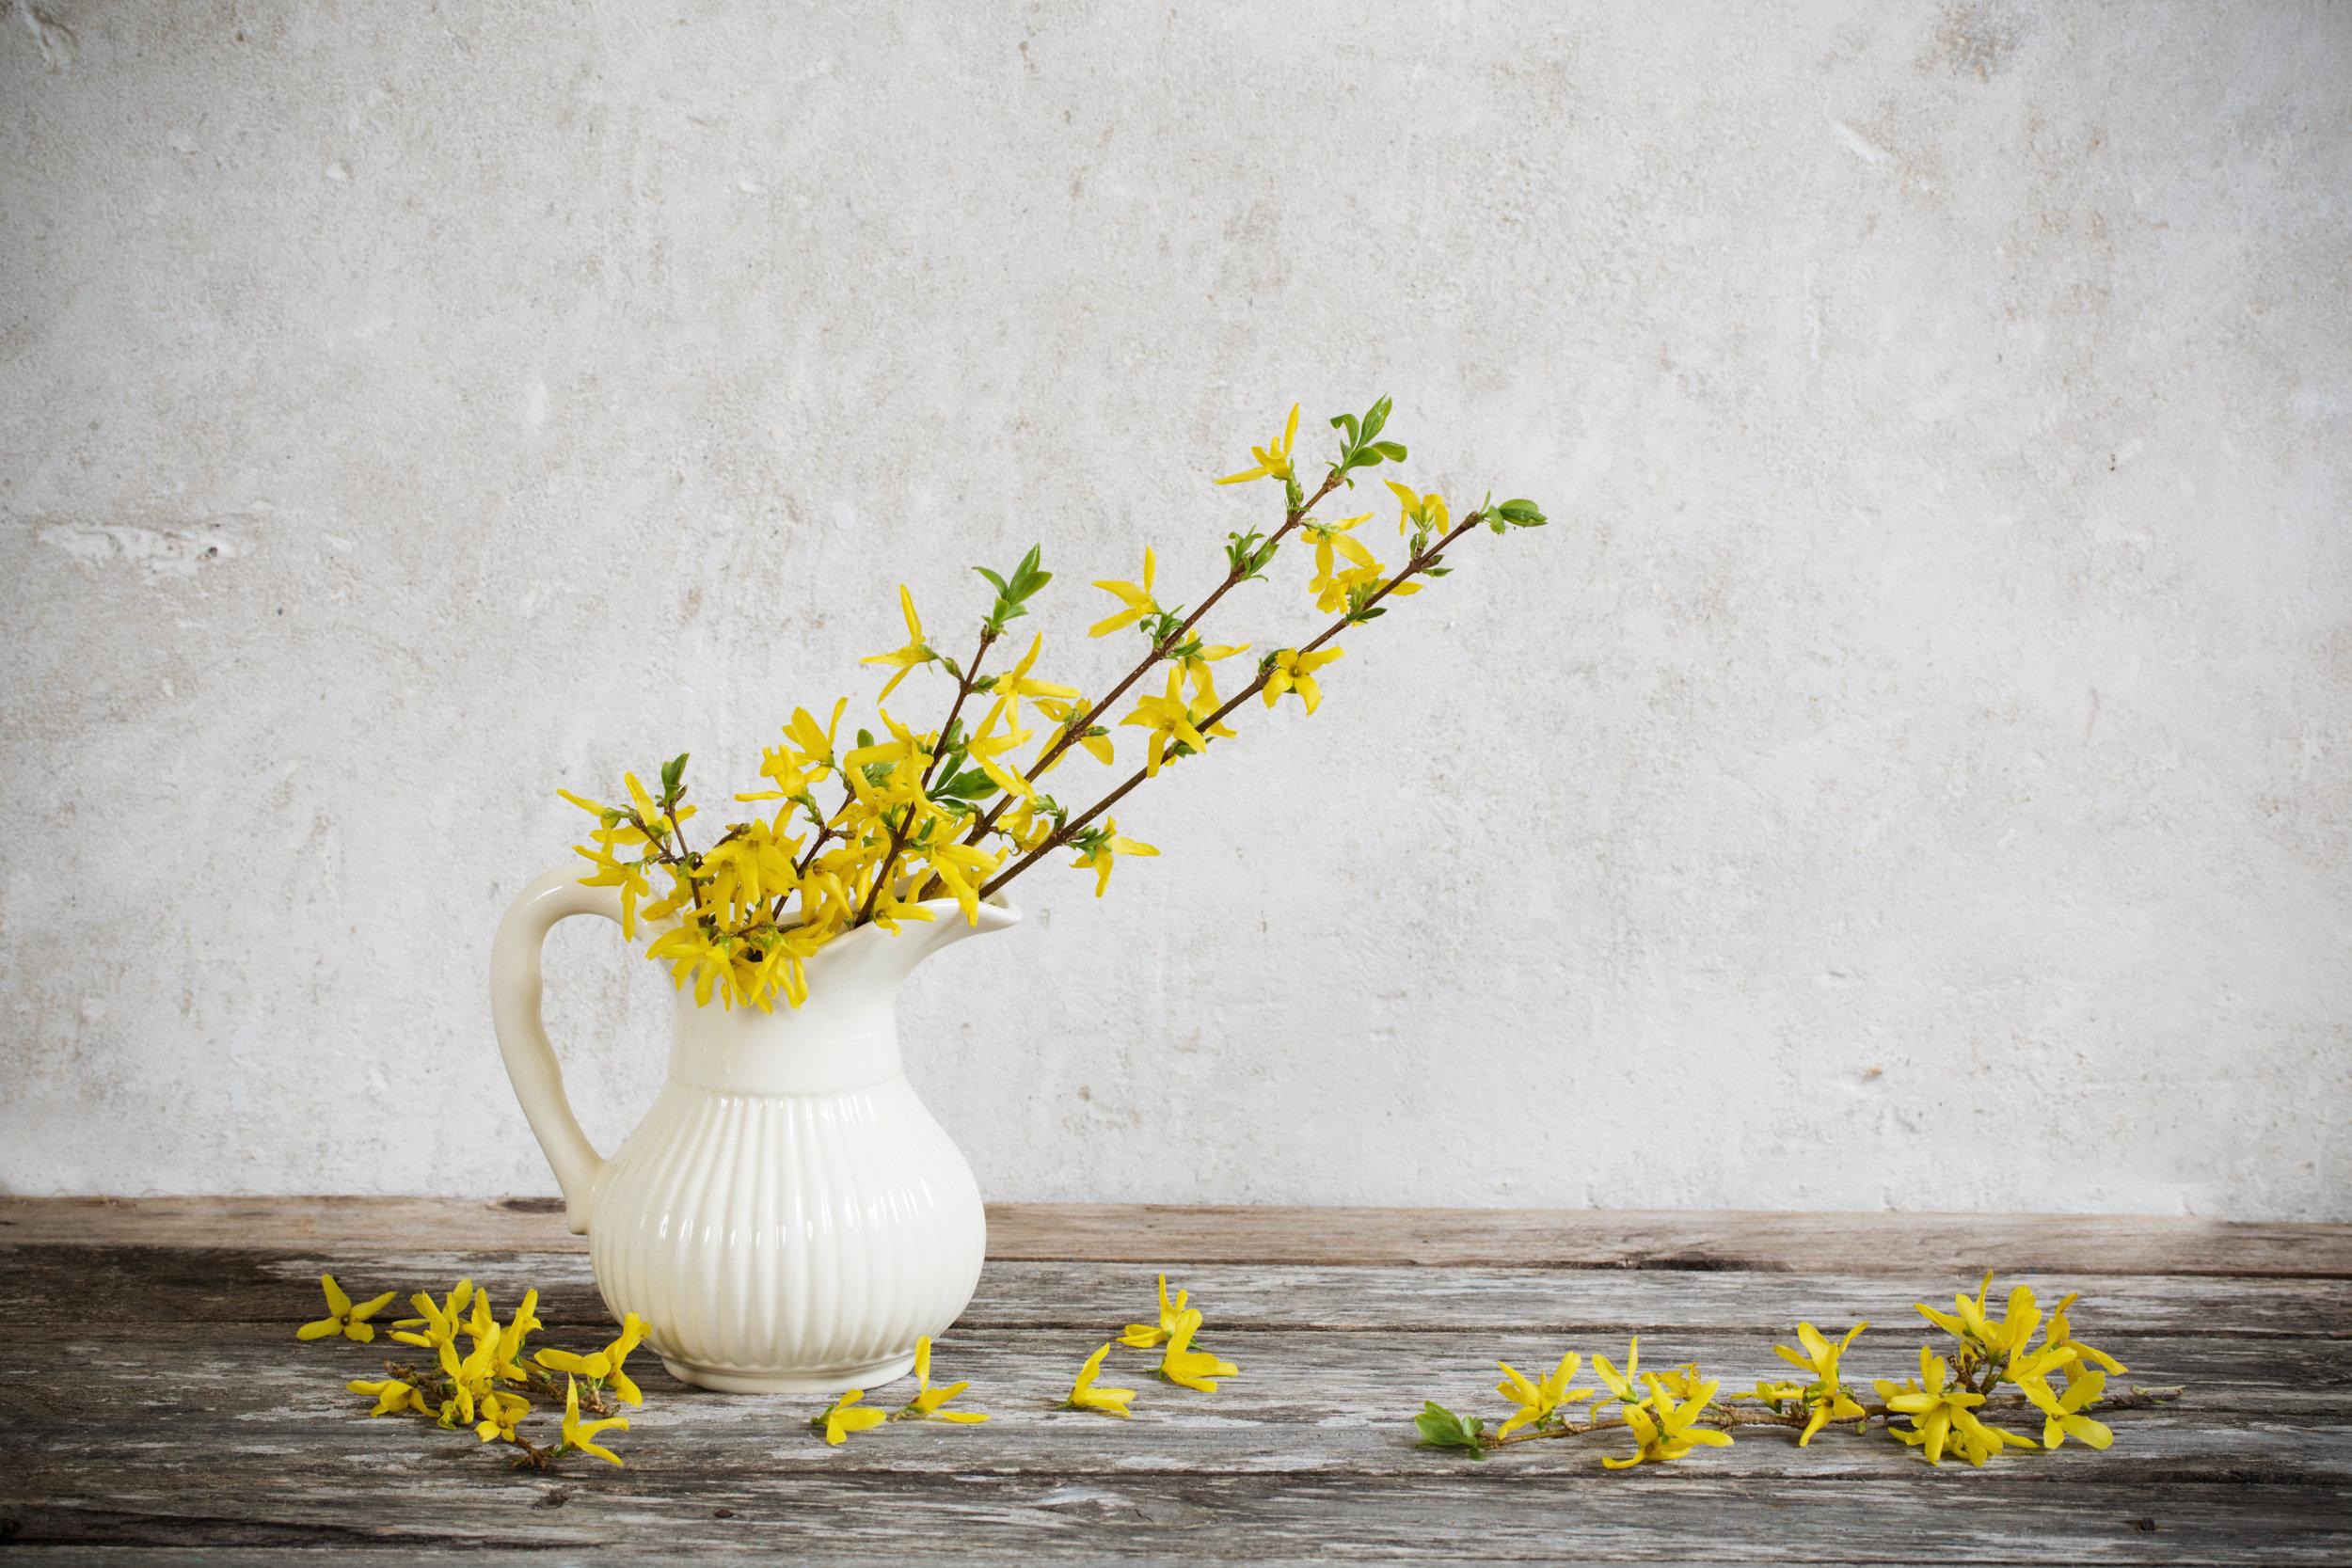 forsythia-flowers-homestead-brooklyn.jpg